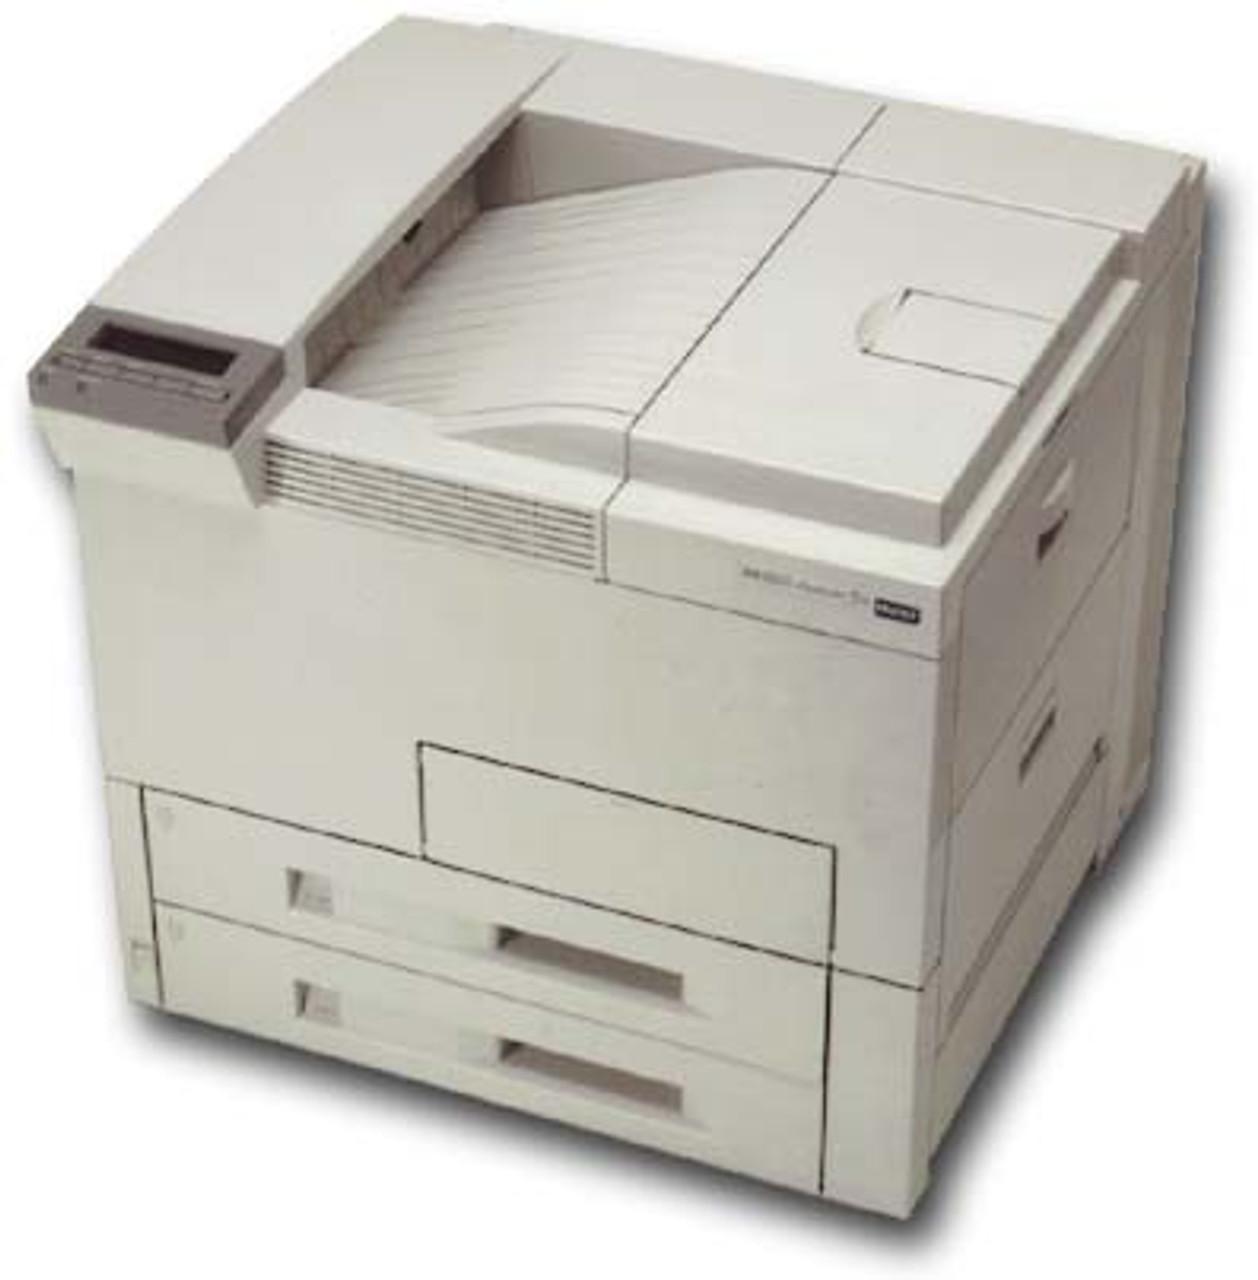 HP LaserJet 5siMX - c3167ar - HP 11x17 Laser Printer for sale